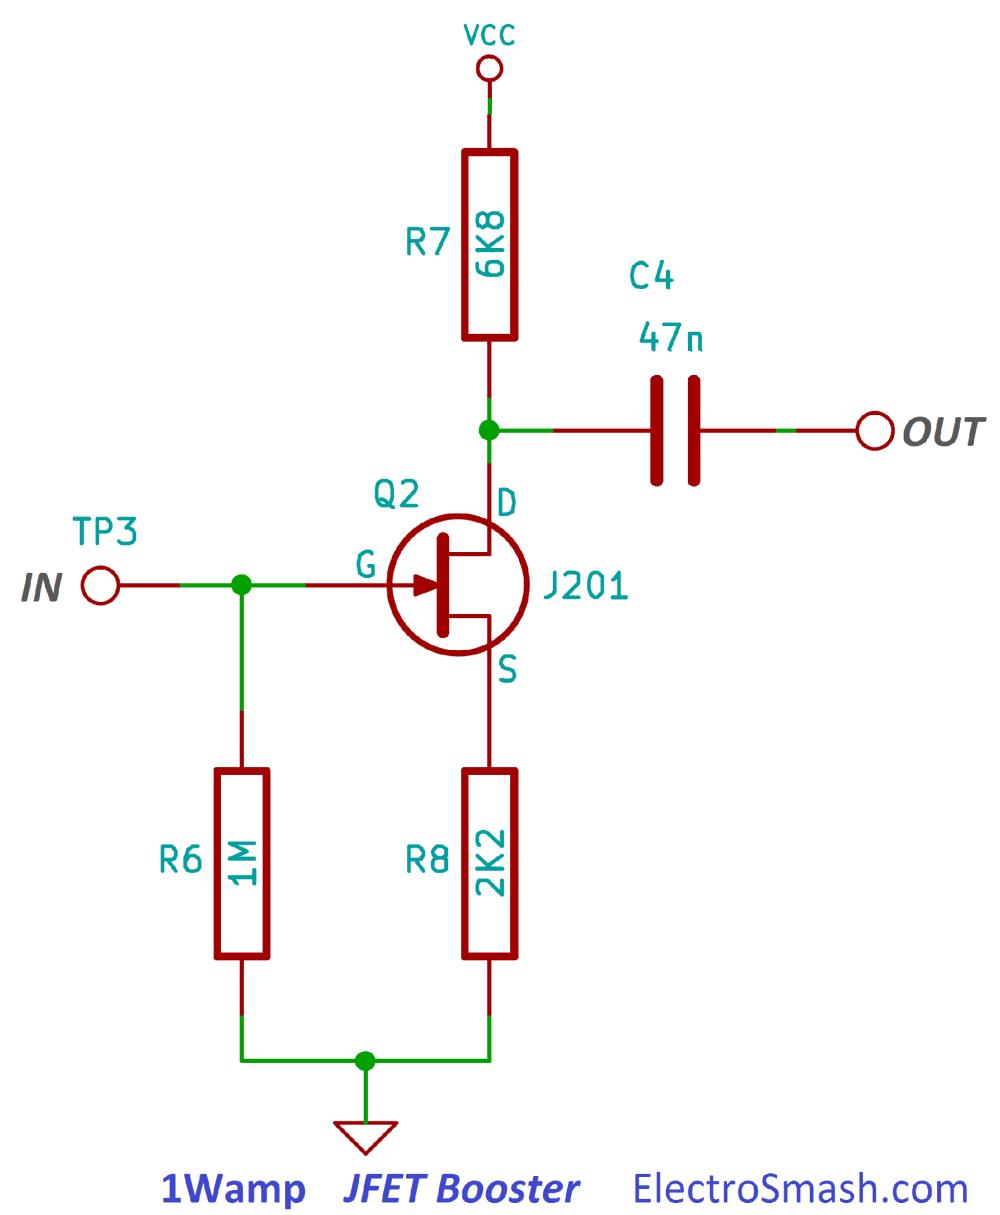 medium resolution of 1wamp jfet booster circuit